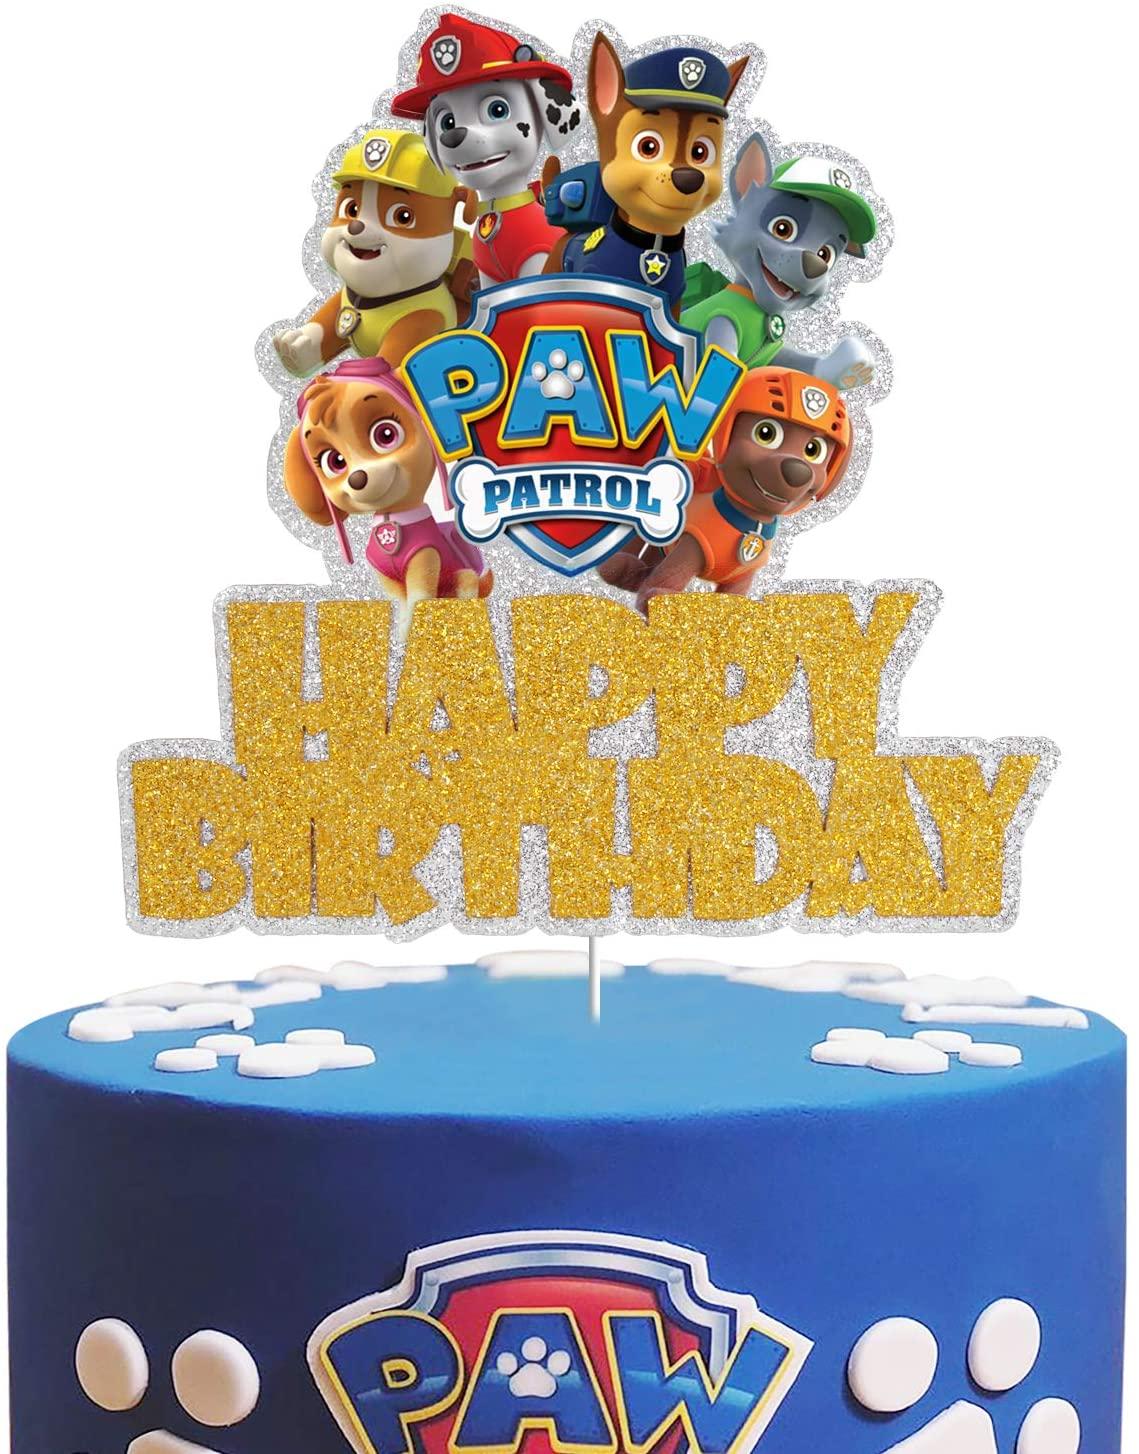 Dog Paw Patrol Happy Birrthday Cake Topper - Claw Dog Patrol Party Cake Decor,Children's Birthday Baby Shower Party Supplies High Quality